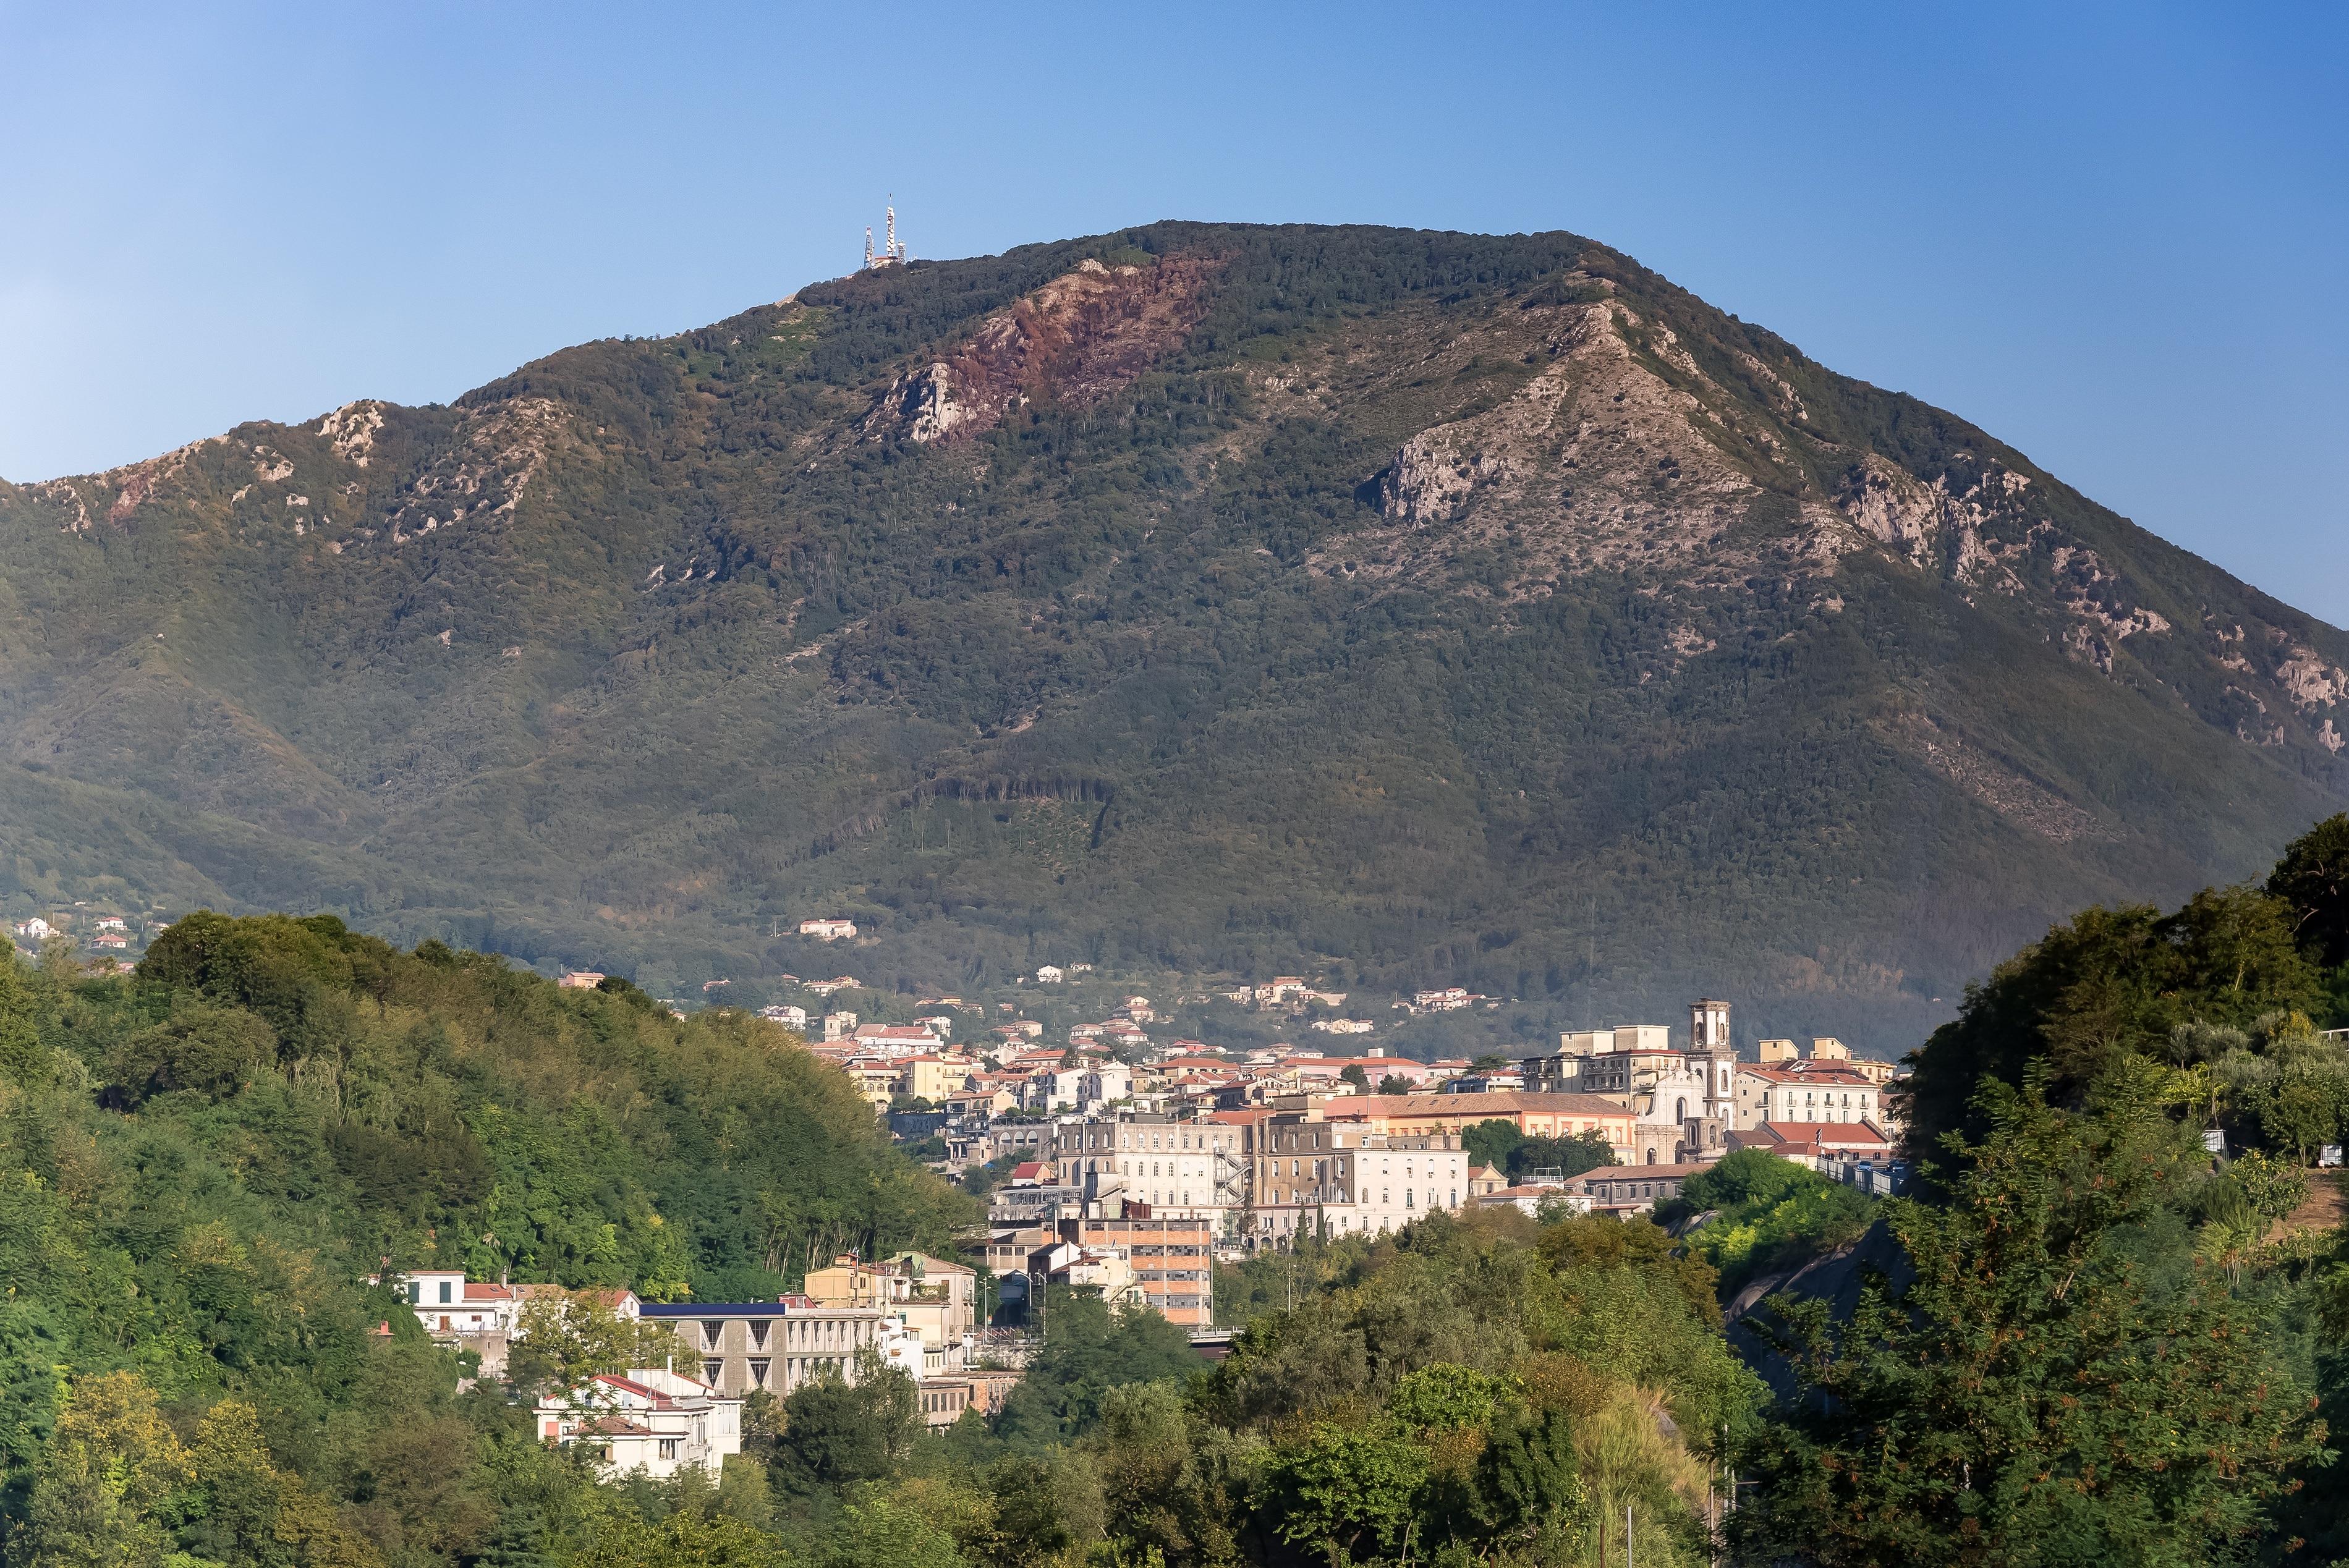 Cava de' Tirreni, Campania, Italy